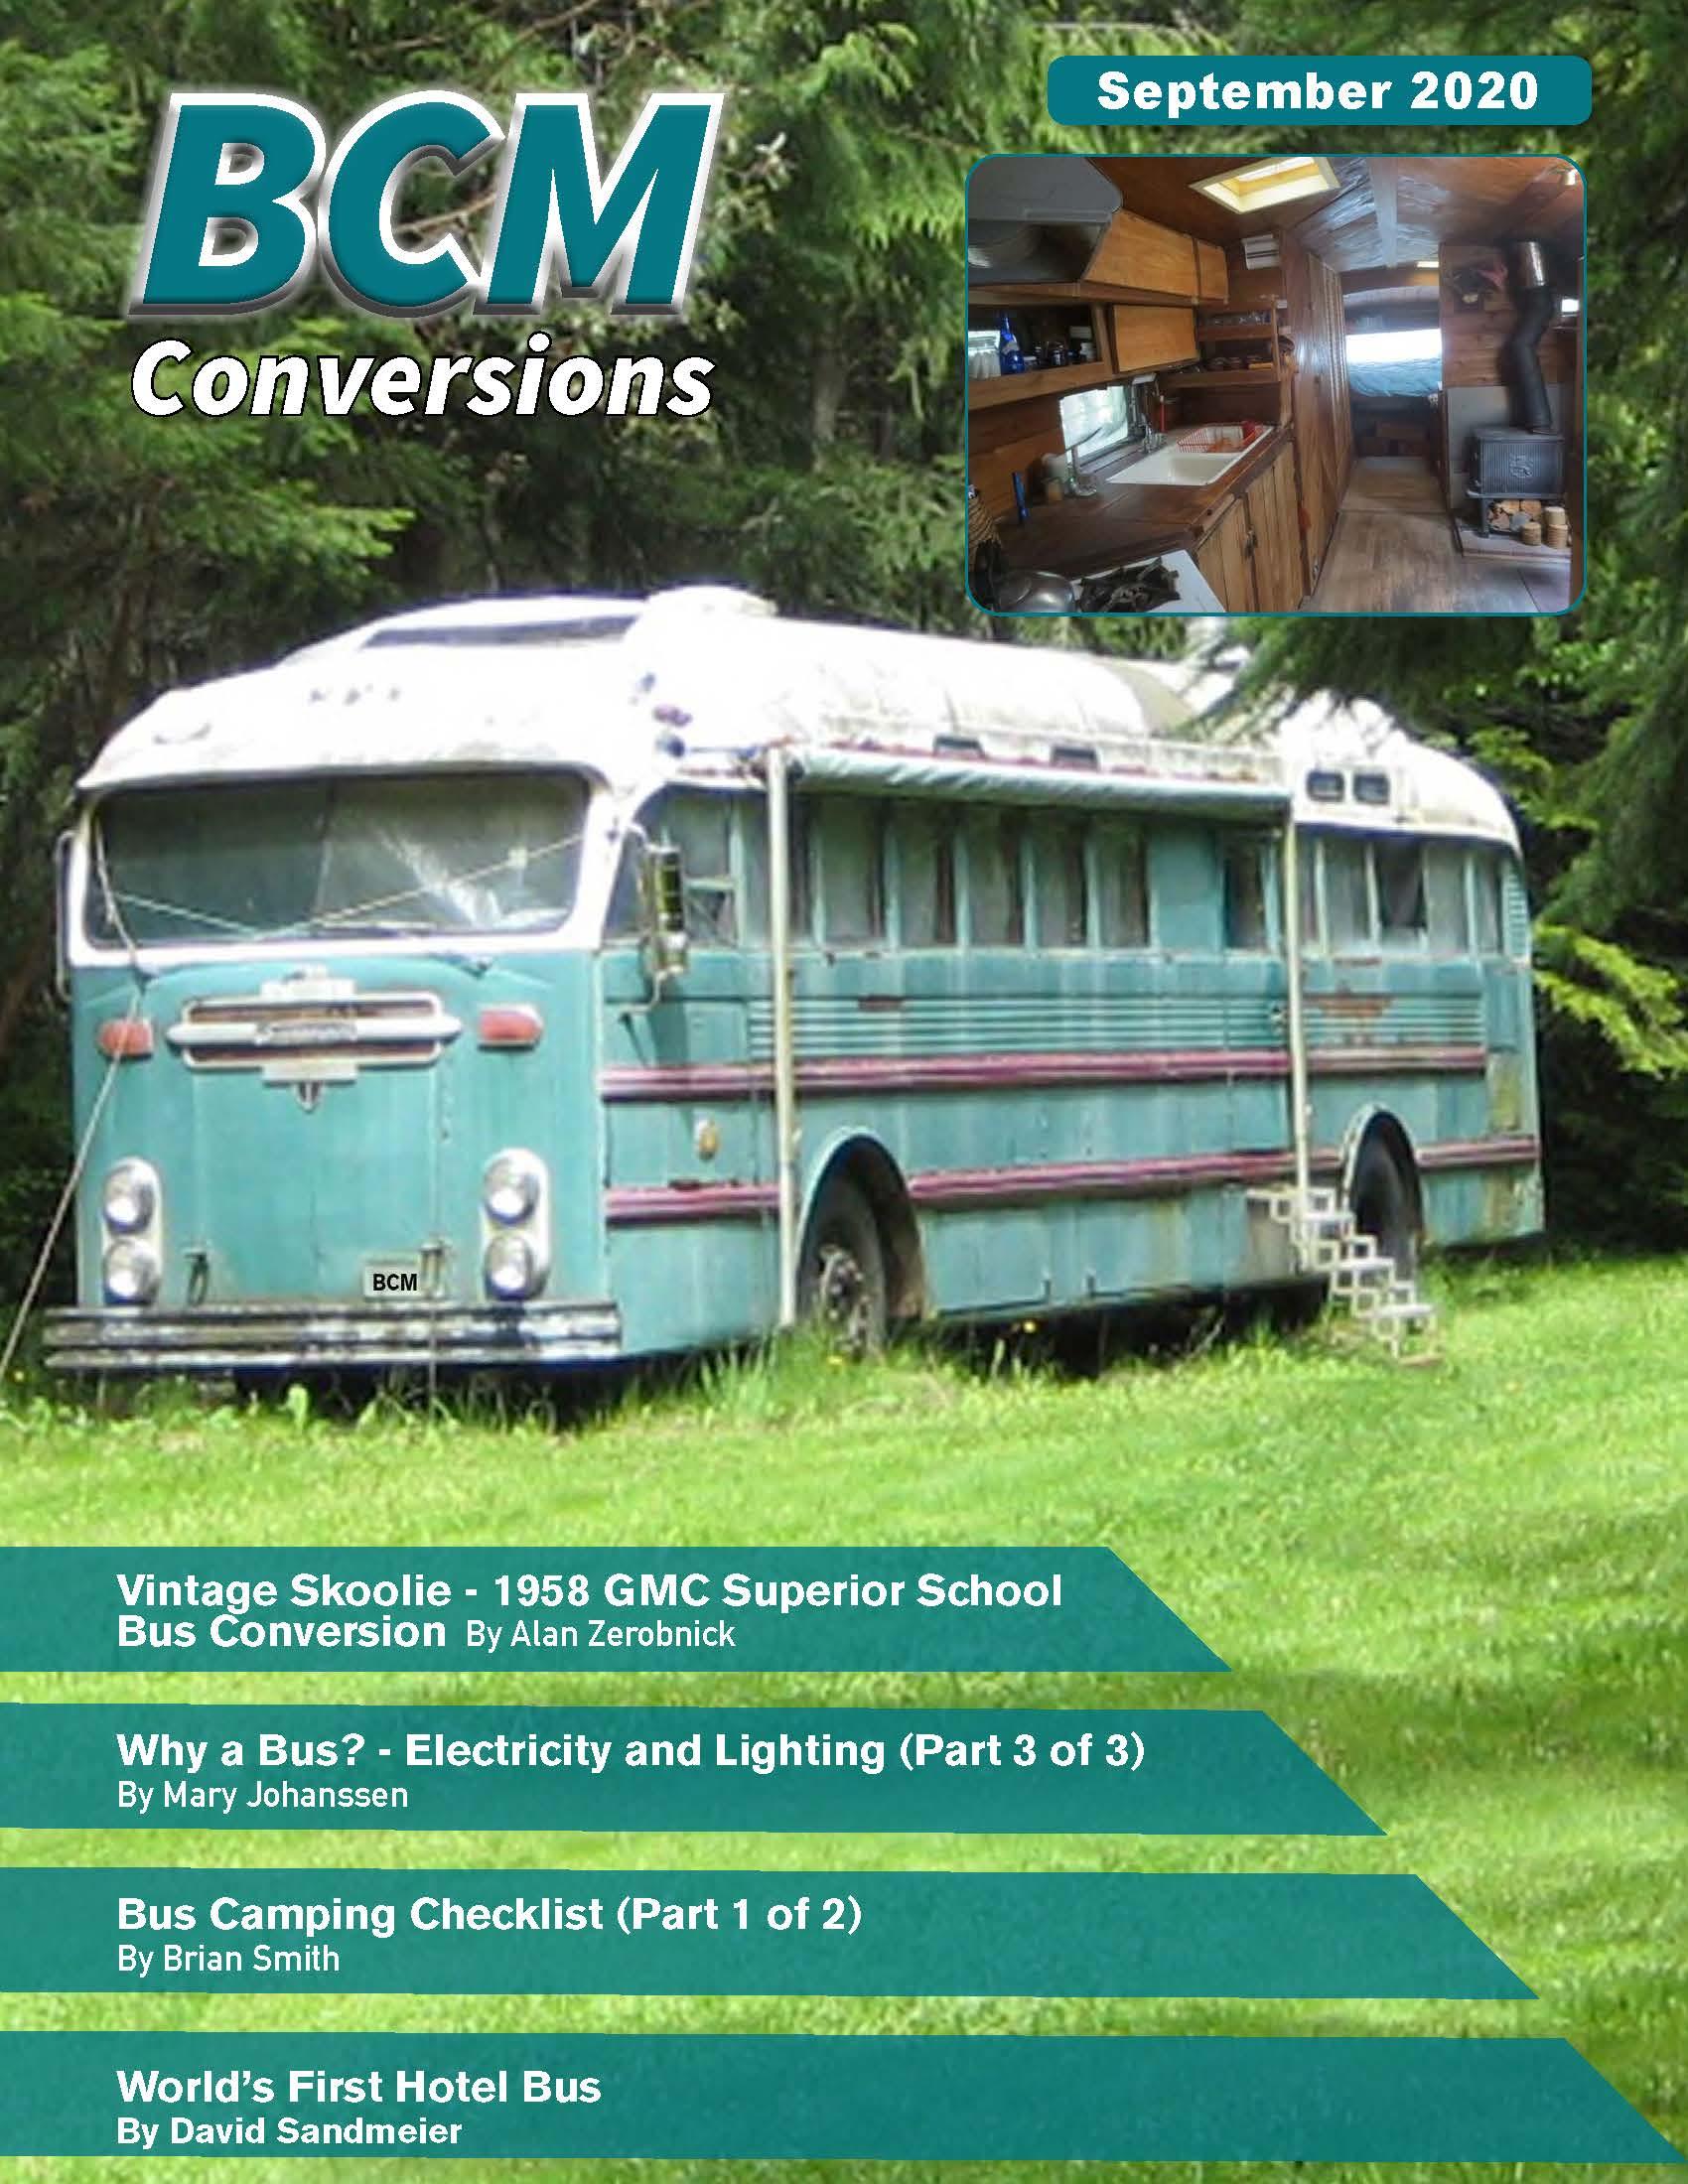 "<a href=""""><img class=""spu-open-10240"" src=""https://www.busconversionmagazine.com/wp-content/uploads/2020/08/September-Issue-2020-Toc.jpg""/></a>"